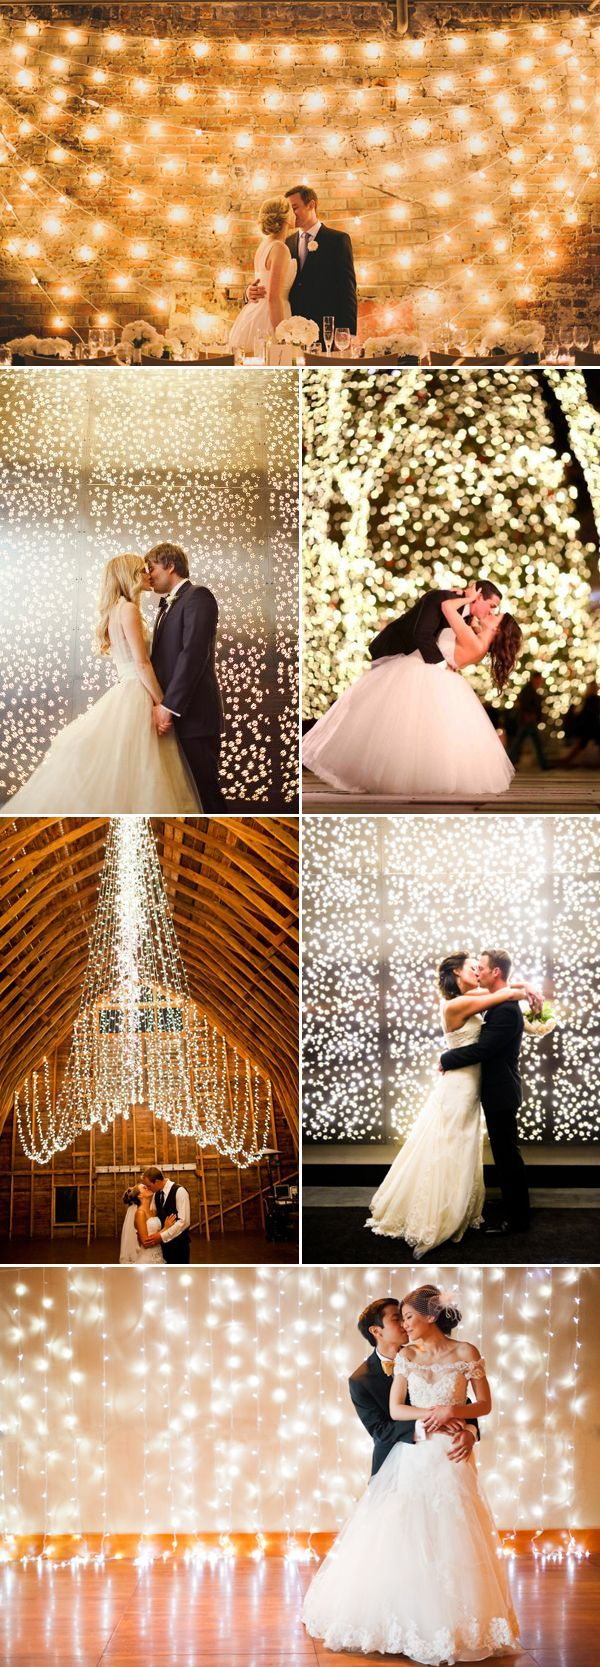 sparkling lights backdrops for wedding ceremony ideas 2015